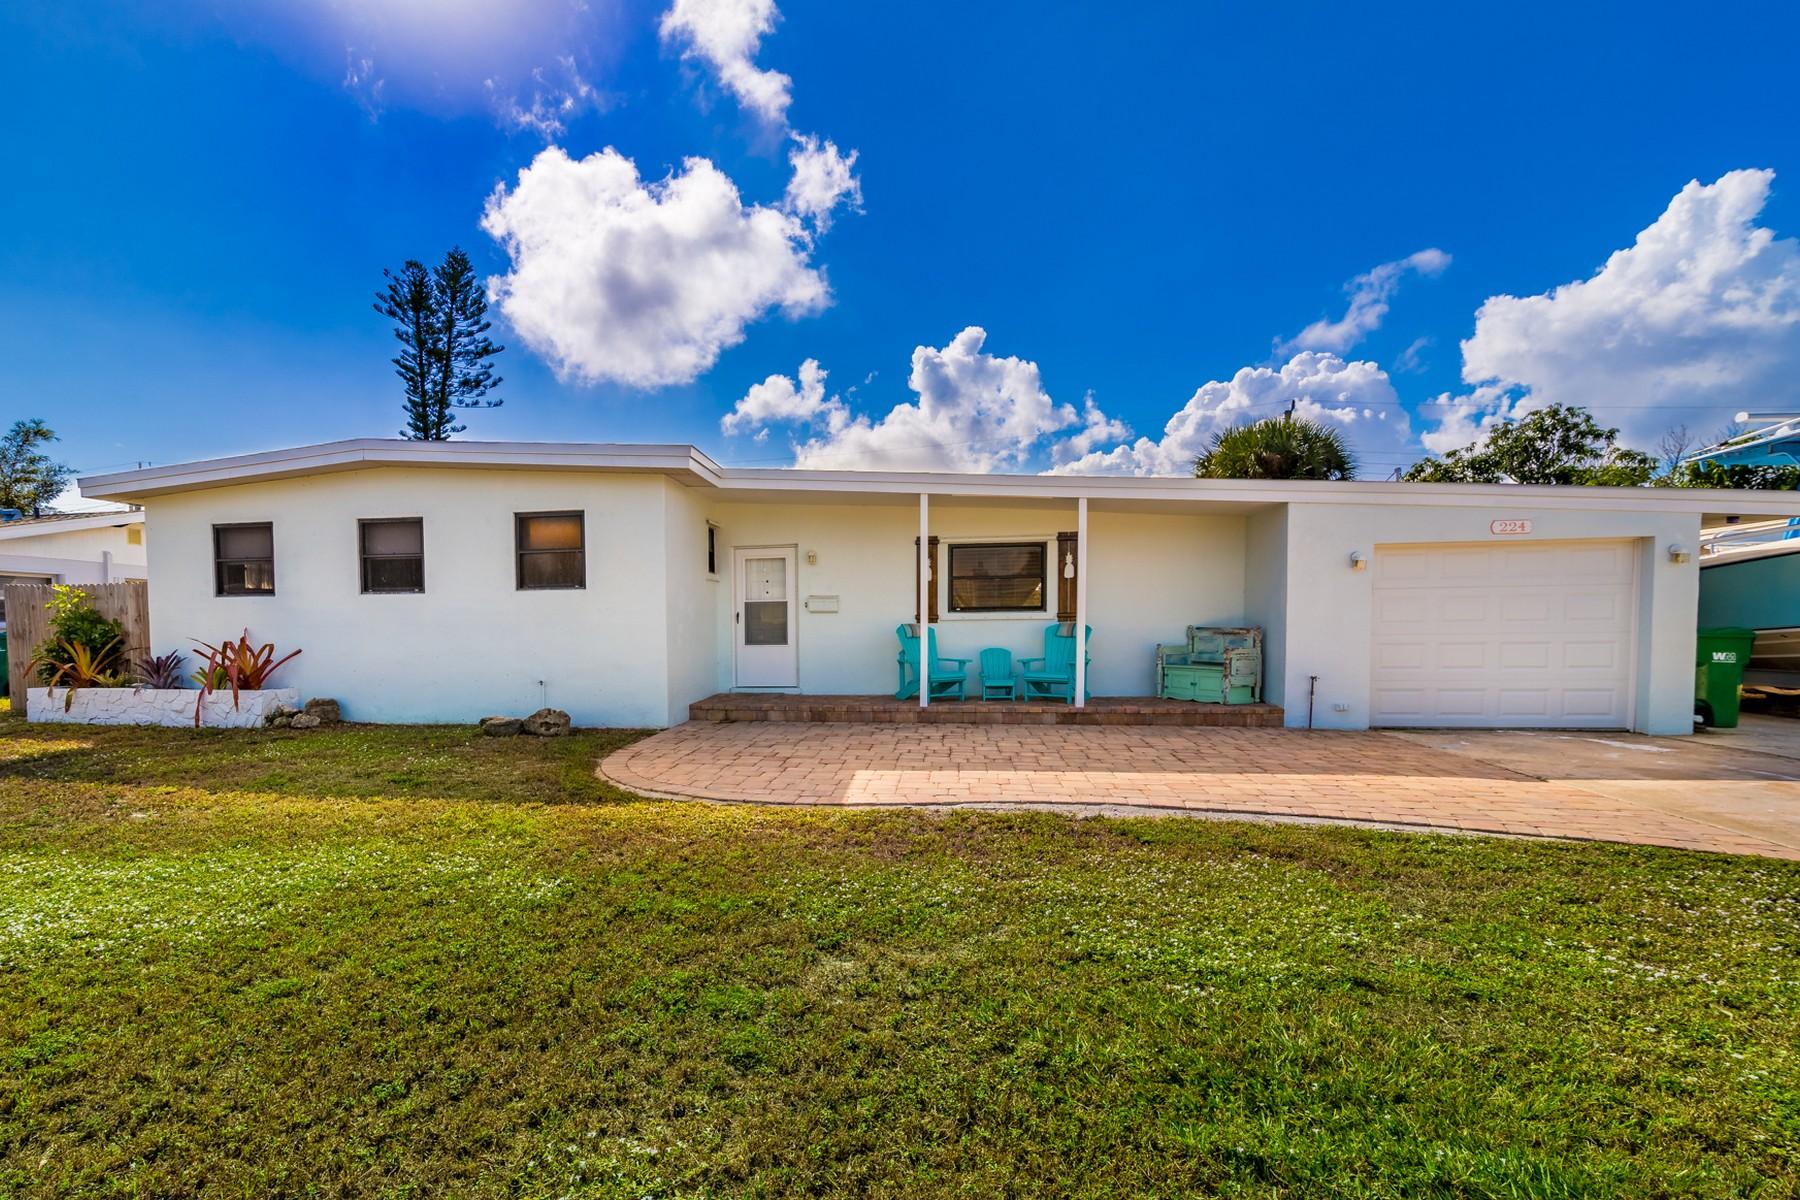 Coastal Cottage 224 NE First Court Satellite Beach, Florida 32937 Amerika Birleşik Devletleri